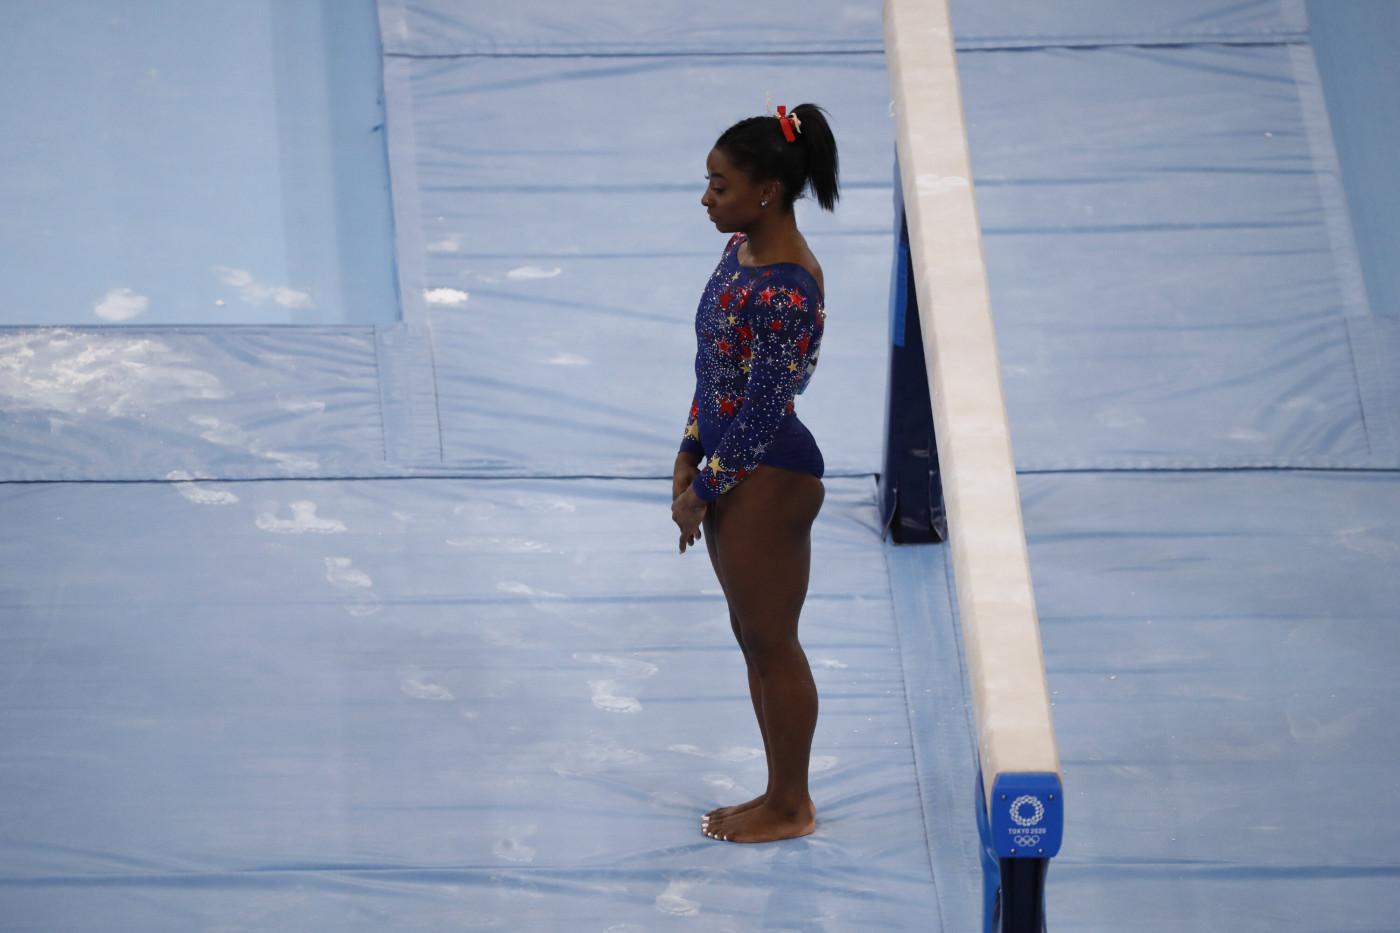 A ginasta Simone Biles, dos Estados Unidos, se apresenta durante a ginástica feminina nos Jogos Olímpicos de Tóquio 2020